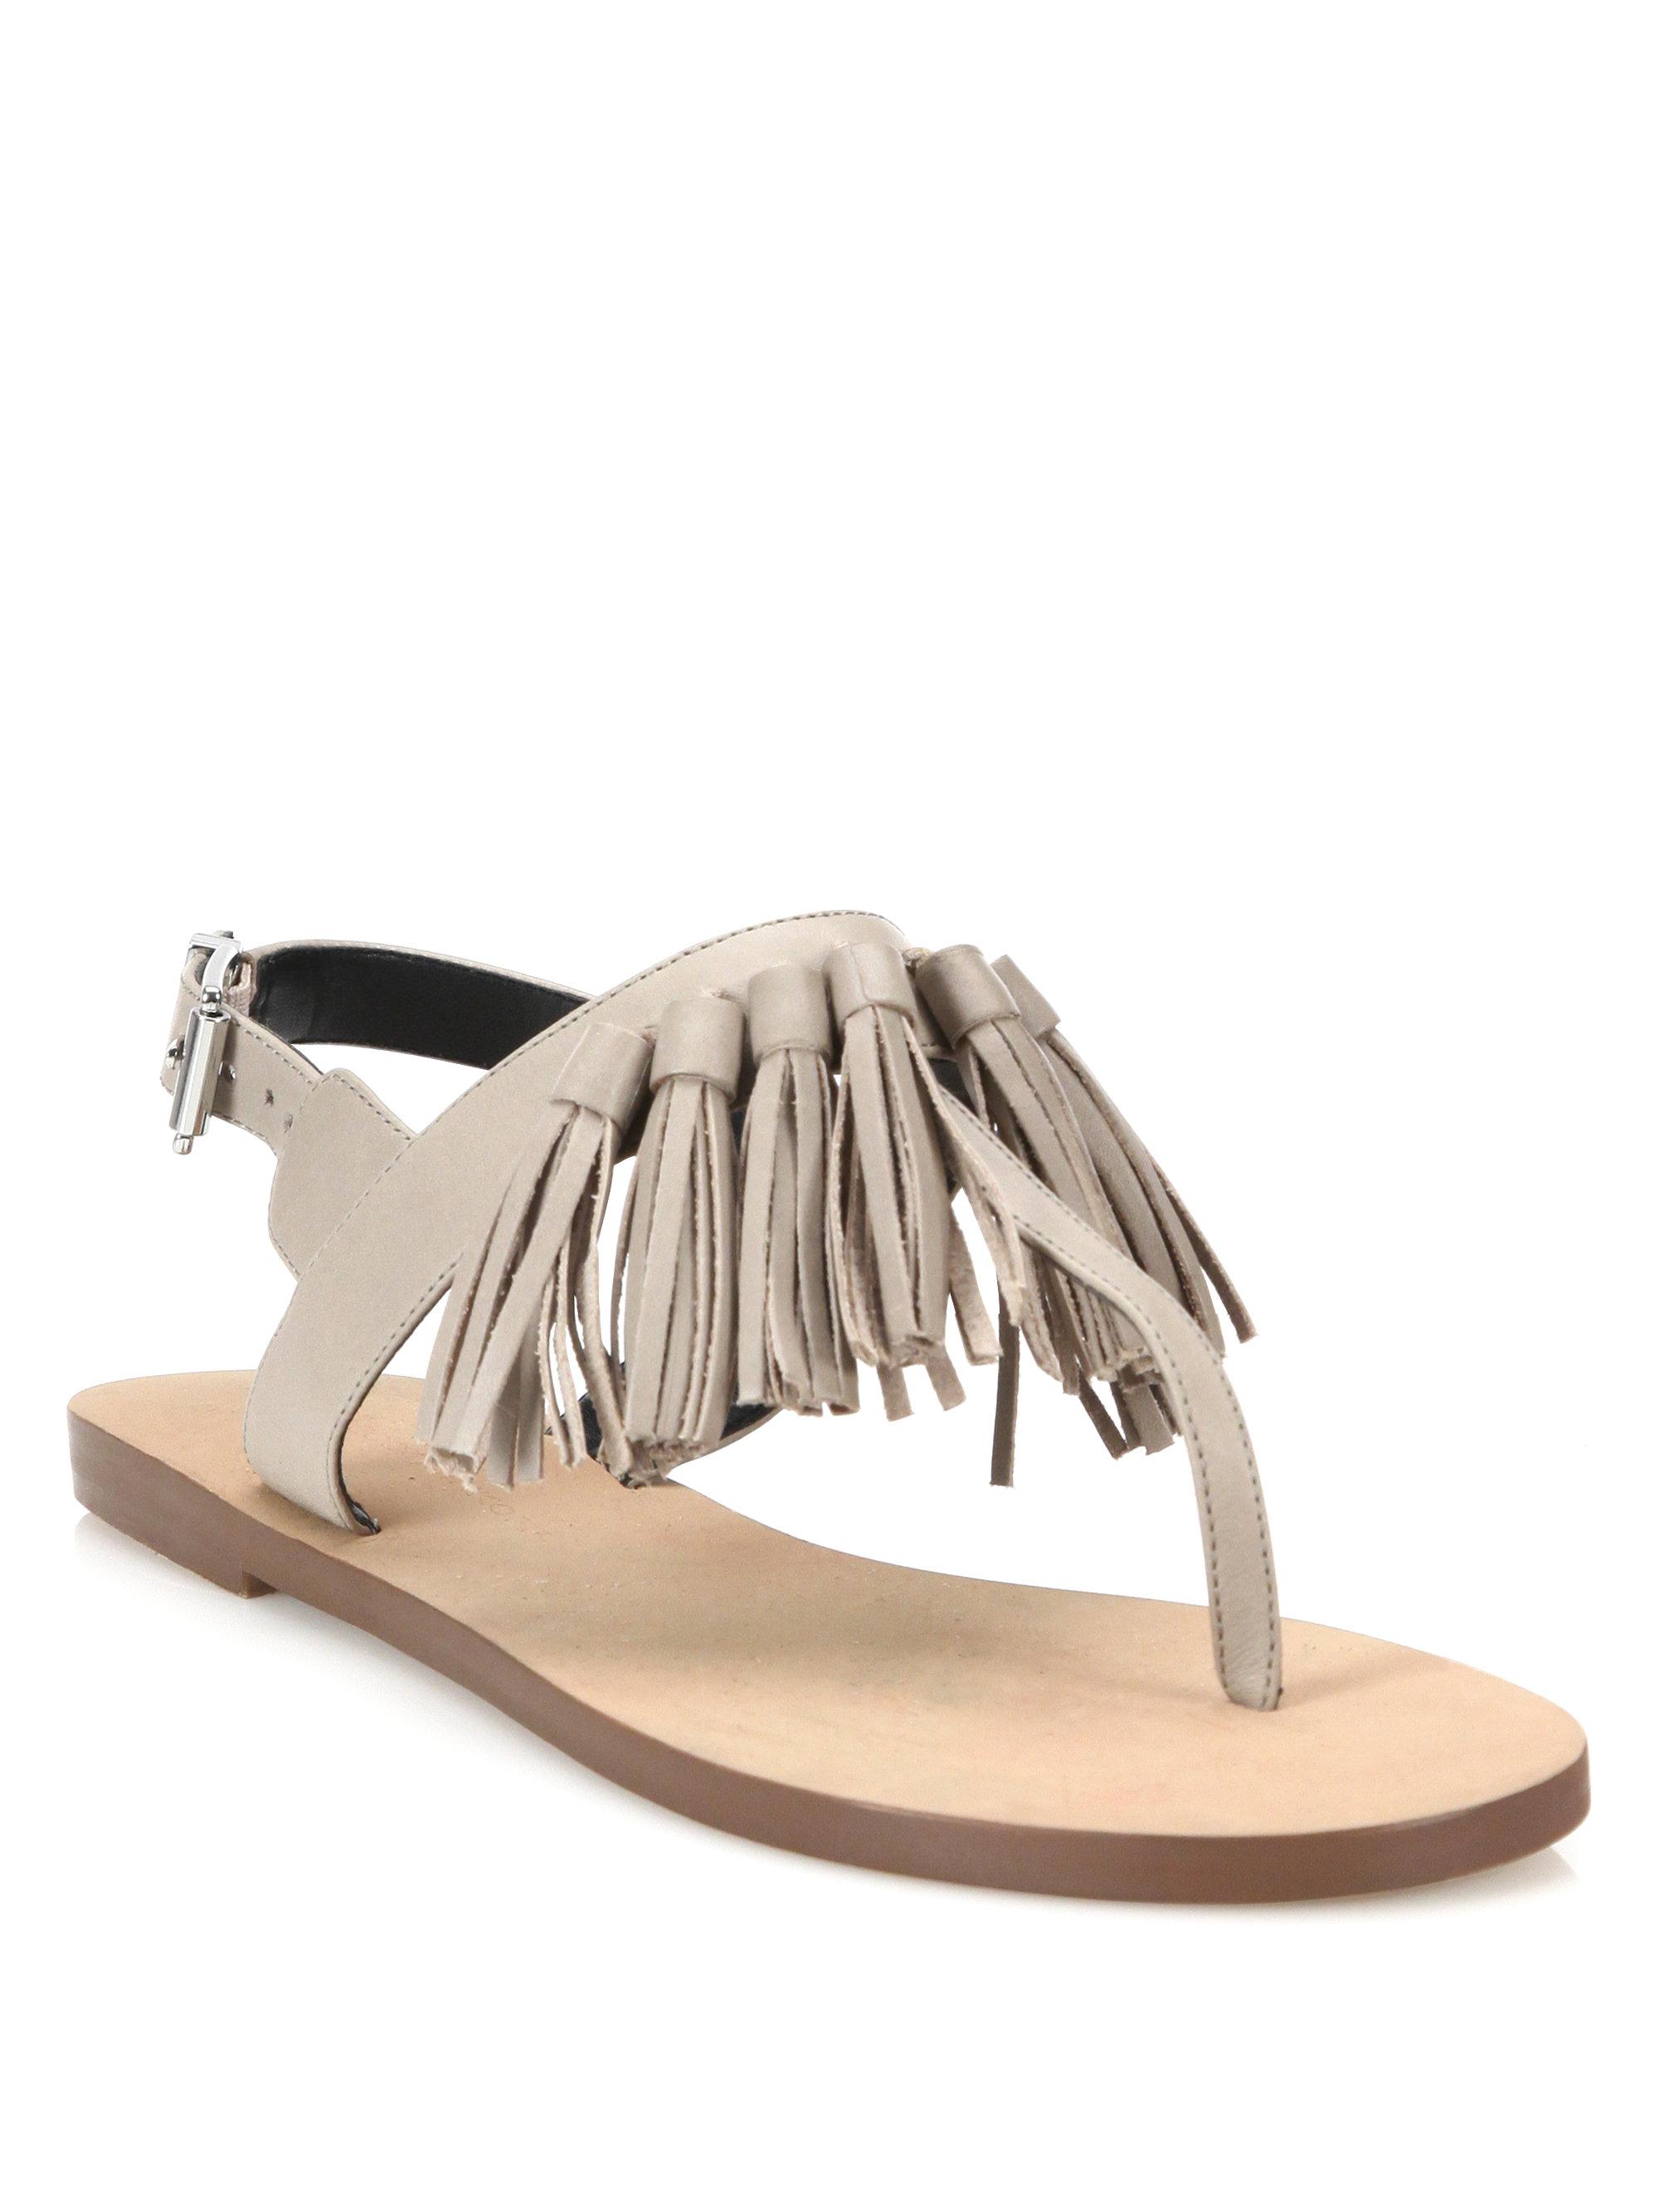 Rebecca Minkoff Erin Leather Tassel Sandal mBOIhDoSK